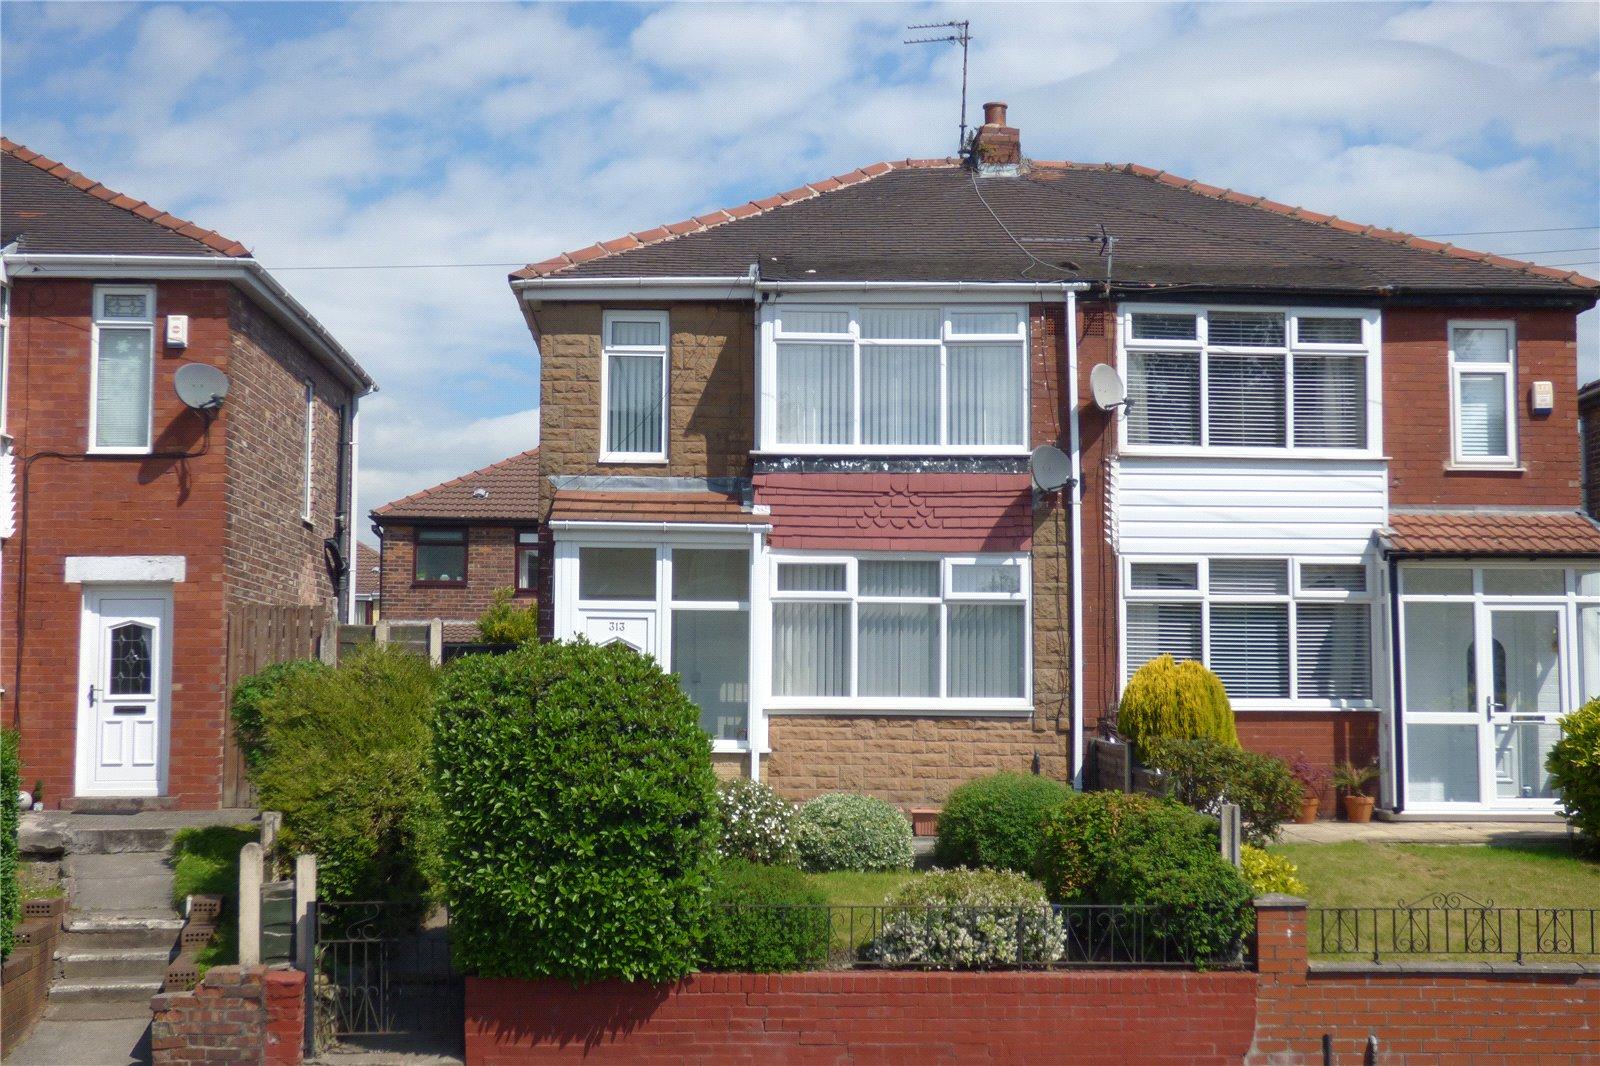 Property details | 3 BedroomSemi | Charlestown Road